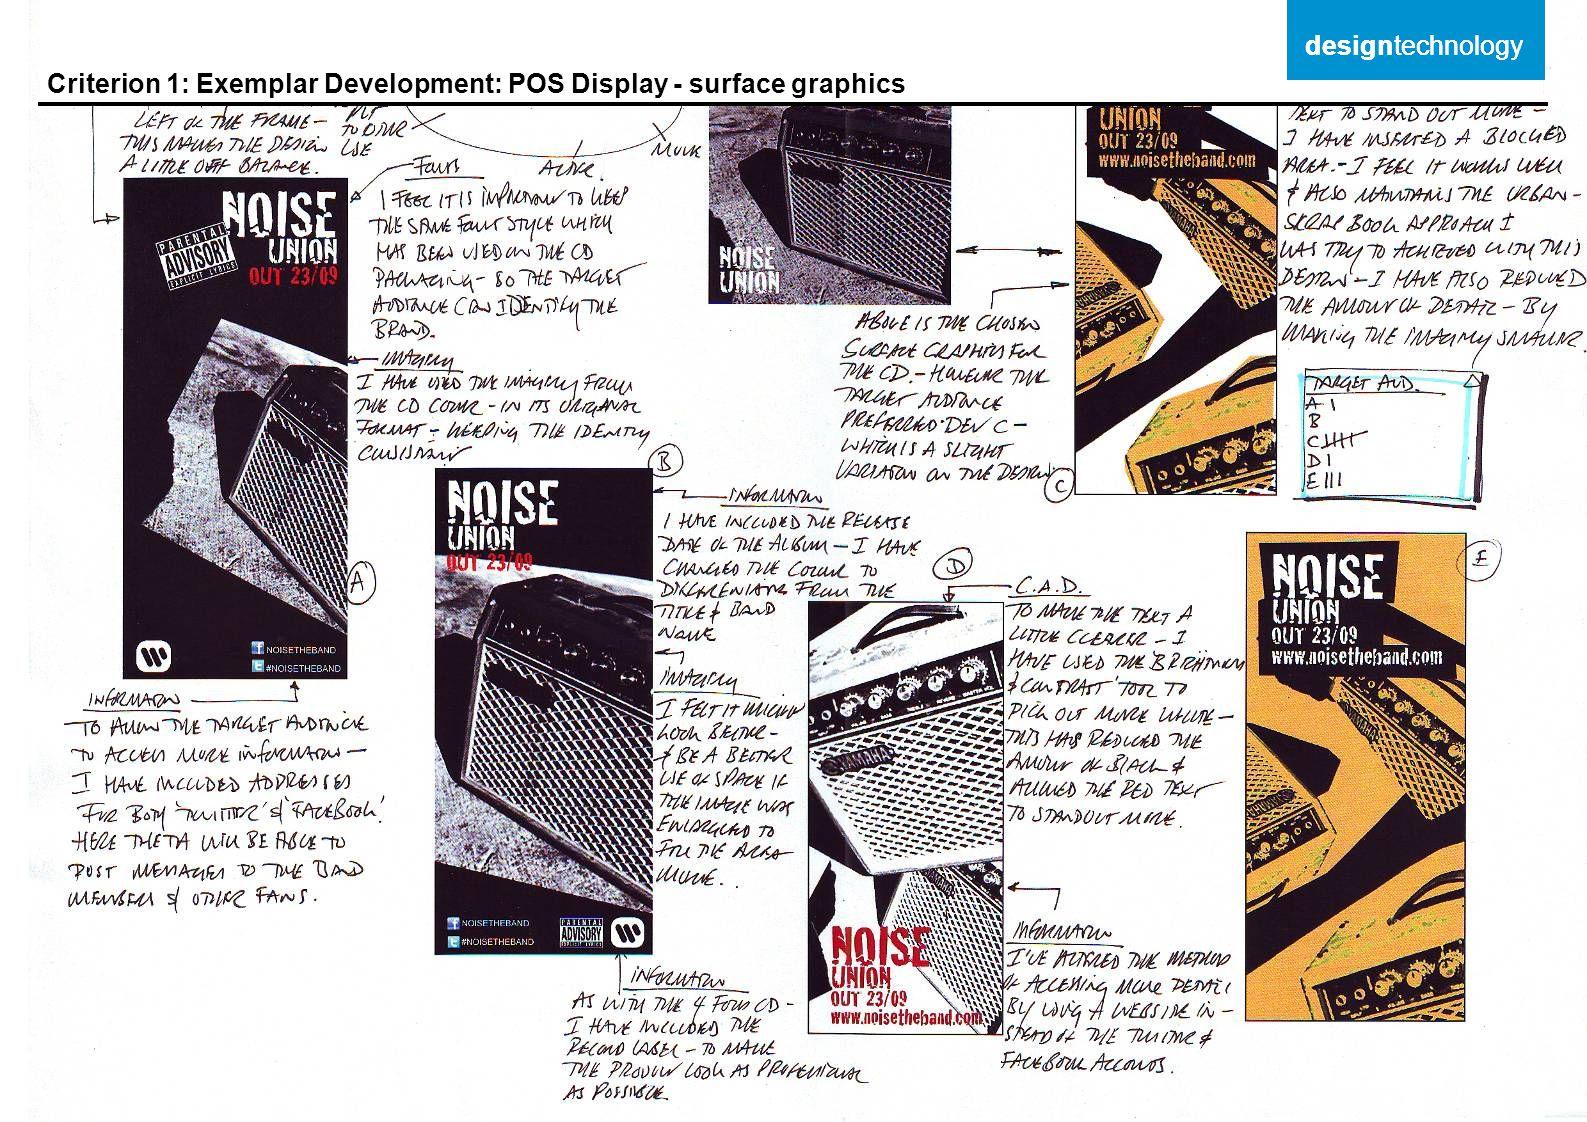 Criterion 1: Exemplar Development: POS Display - surface graphics designtechnology